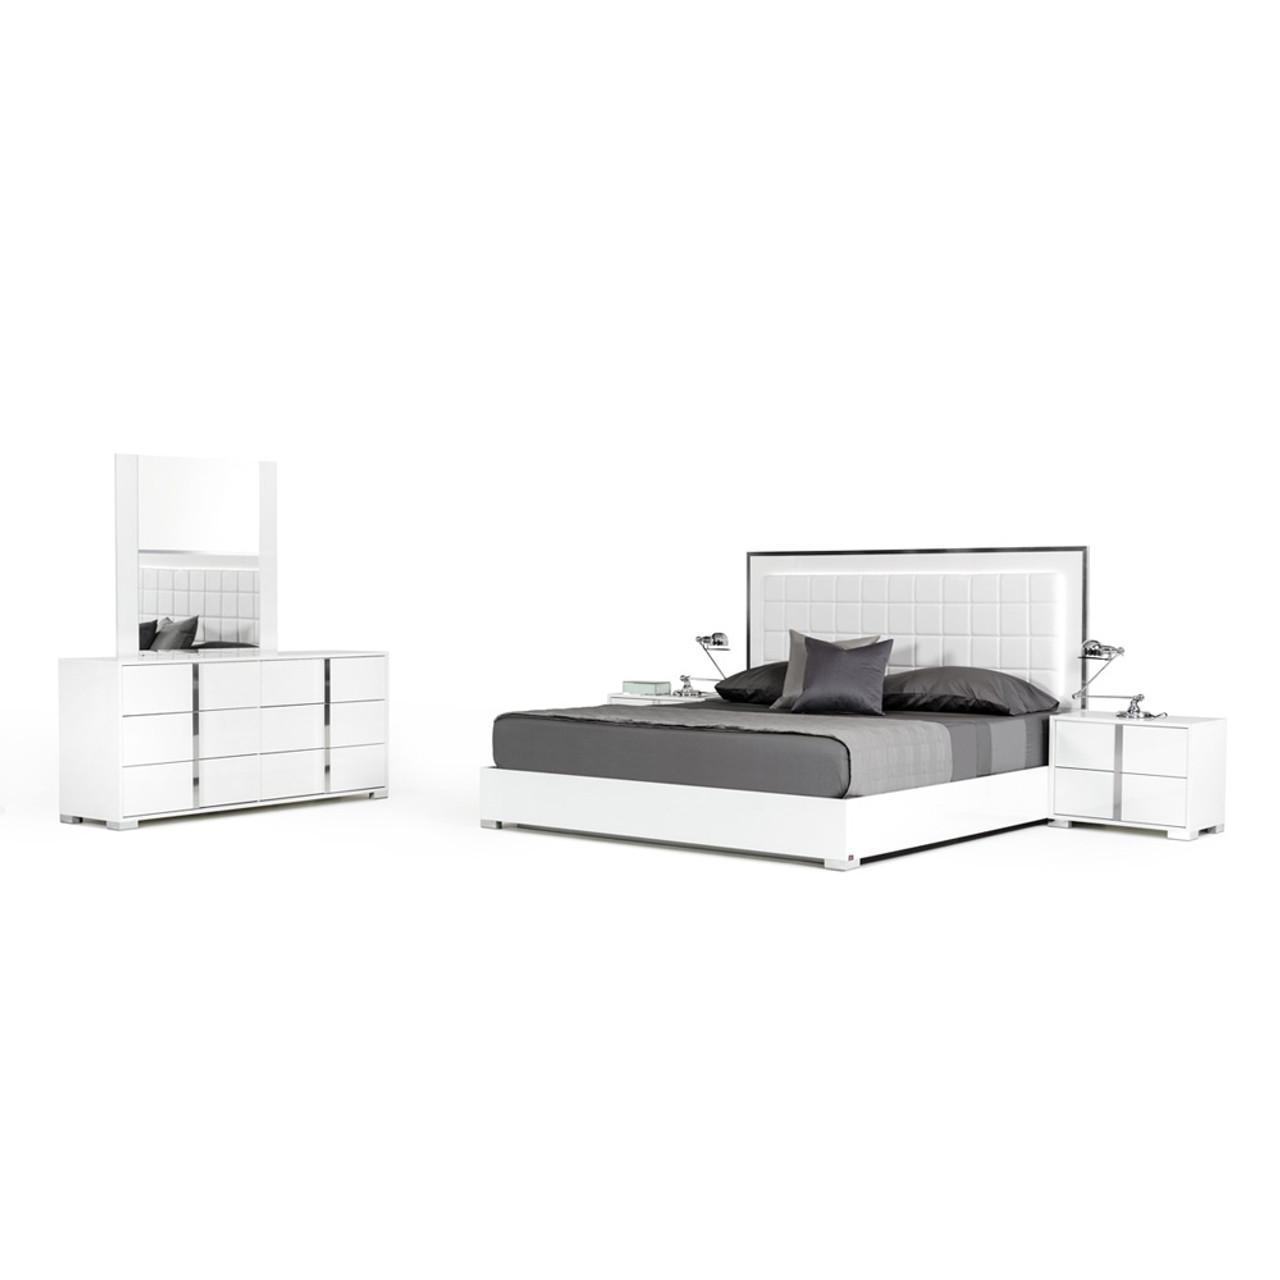 Modrest San Marino Modern White Queen Size Bedroom Set - Lounge LA